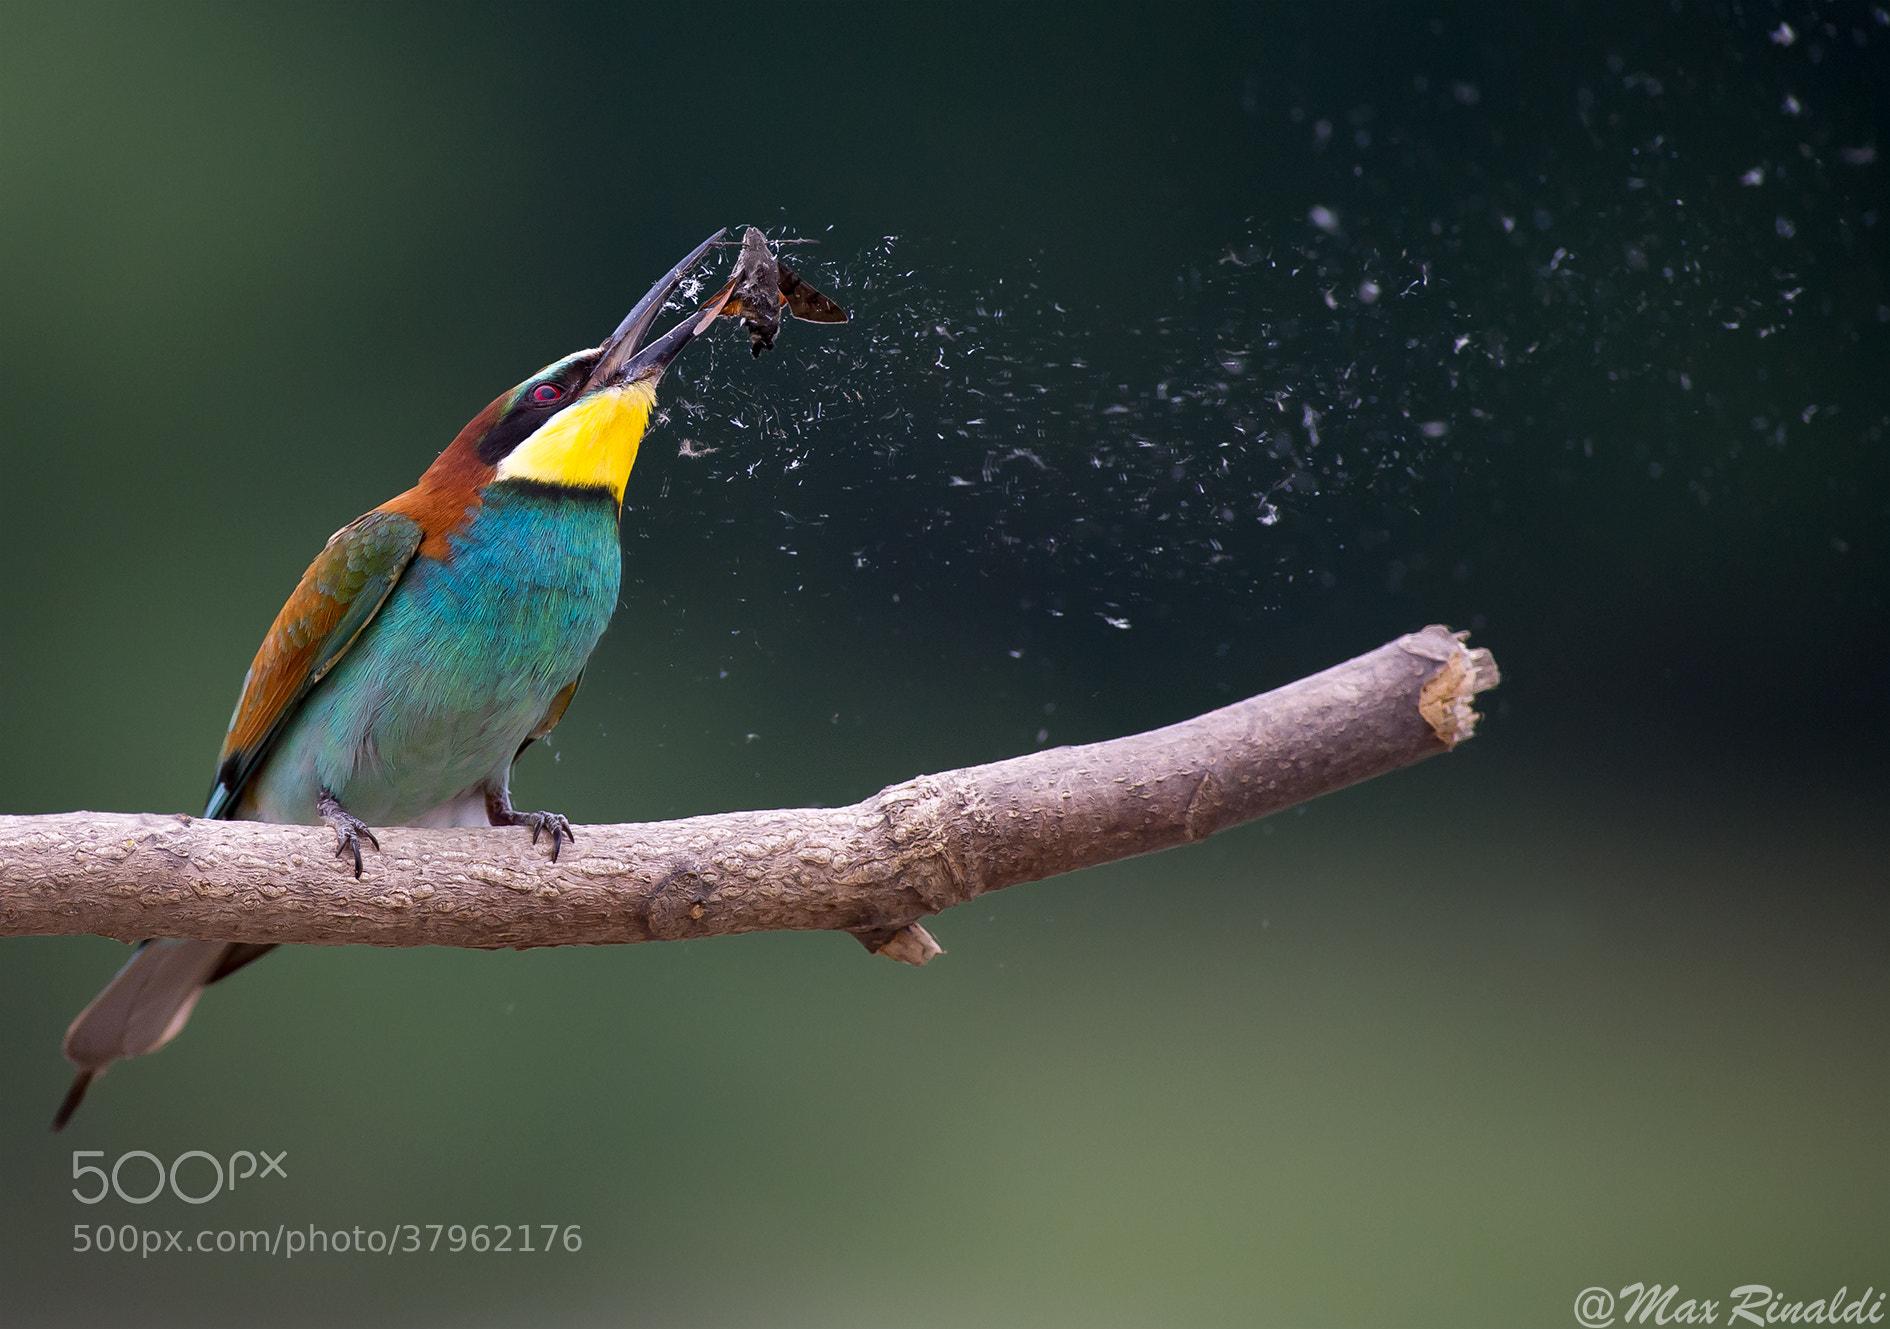 Photograph Shake it! by Max Rinaldi on 500px